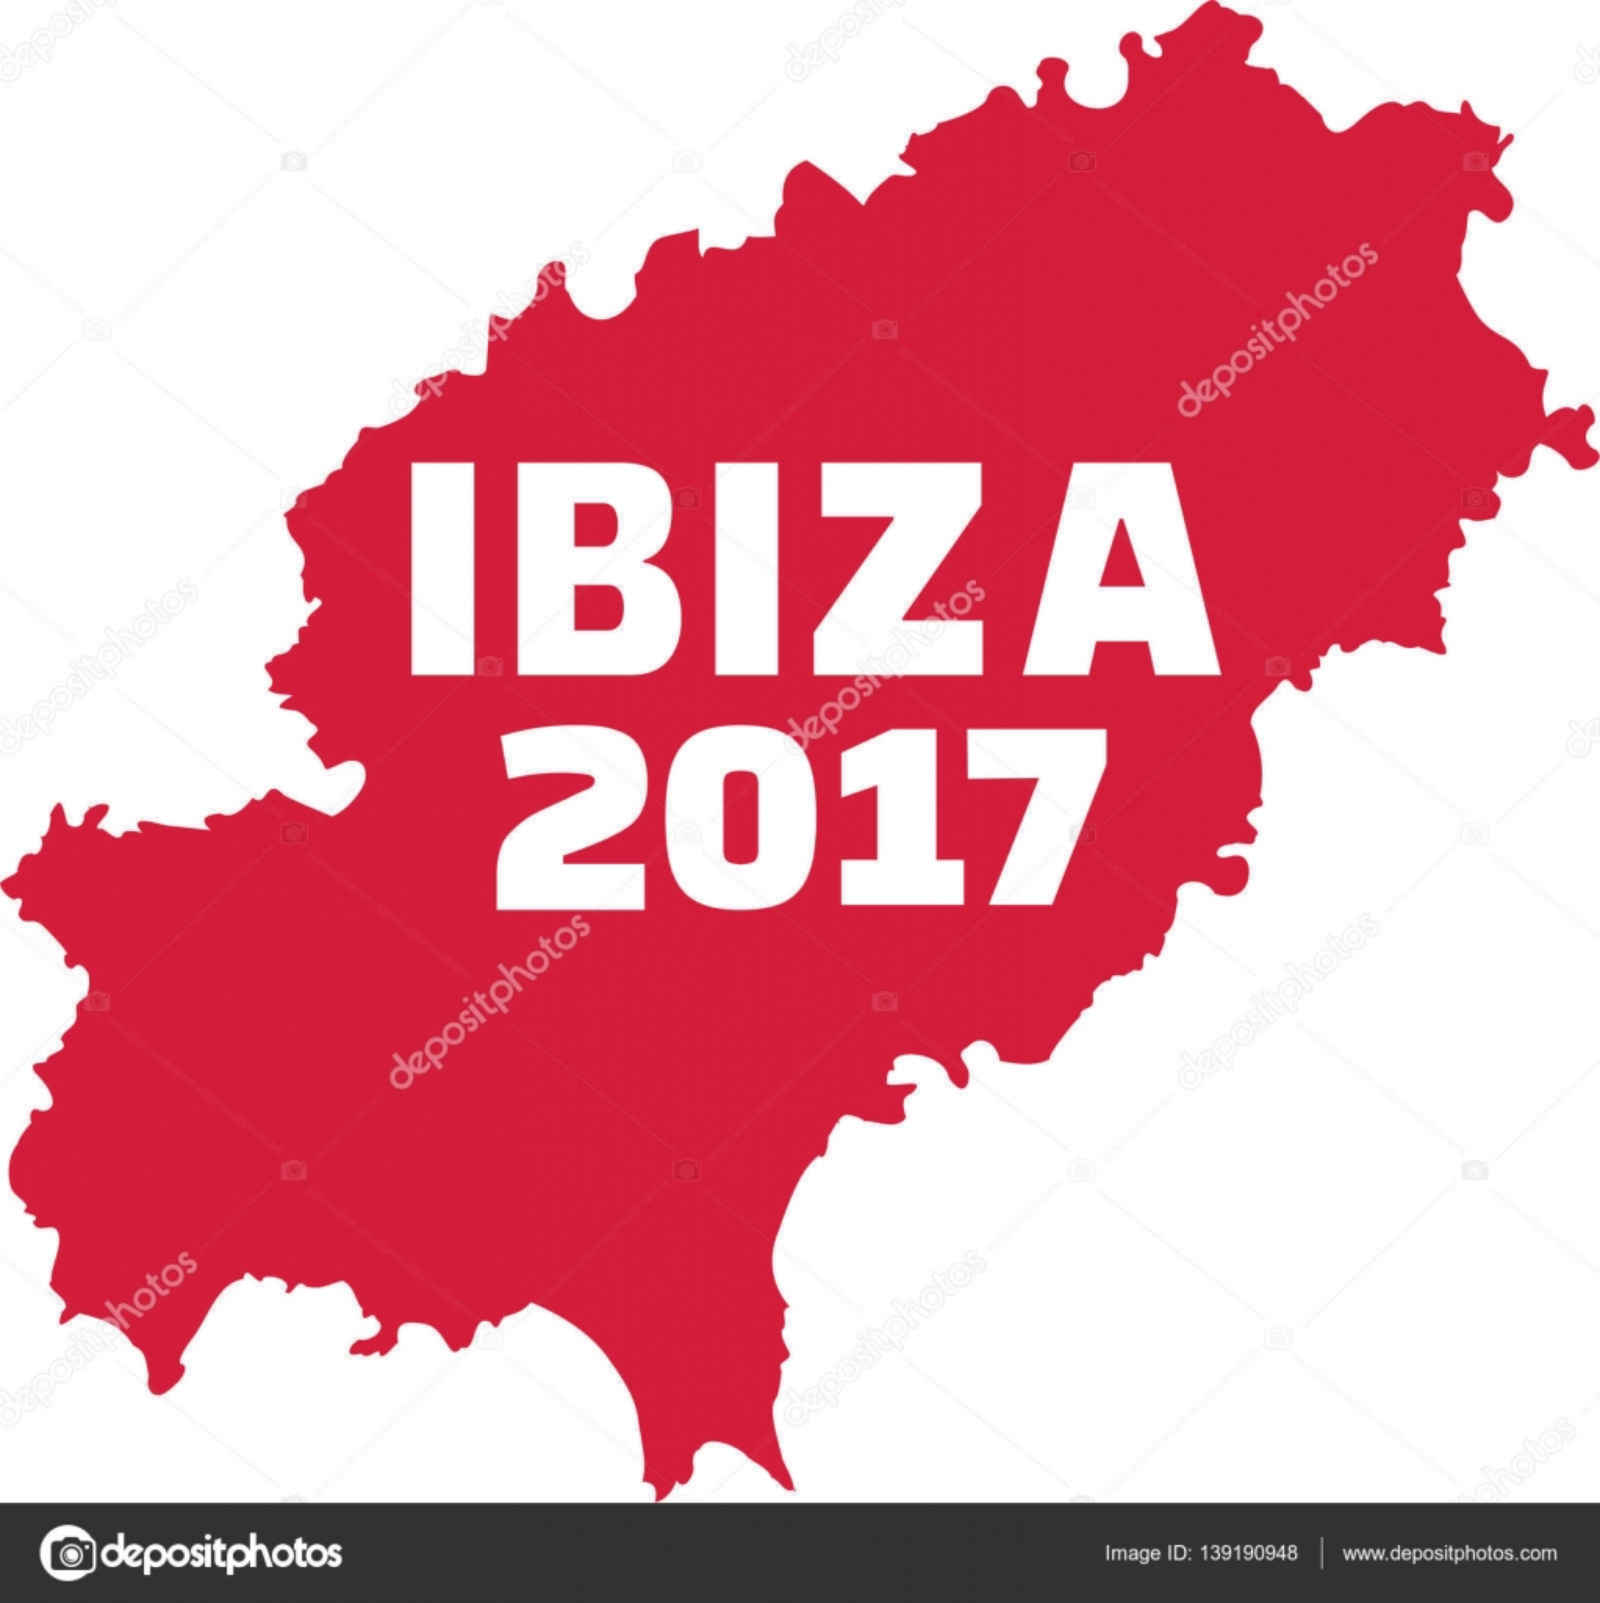 Ibiza Karte Umriss.Karte Von Ibiza Mit Ibiza 2017 Stockvektor Miceking 139190948